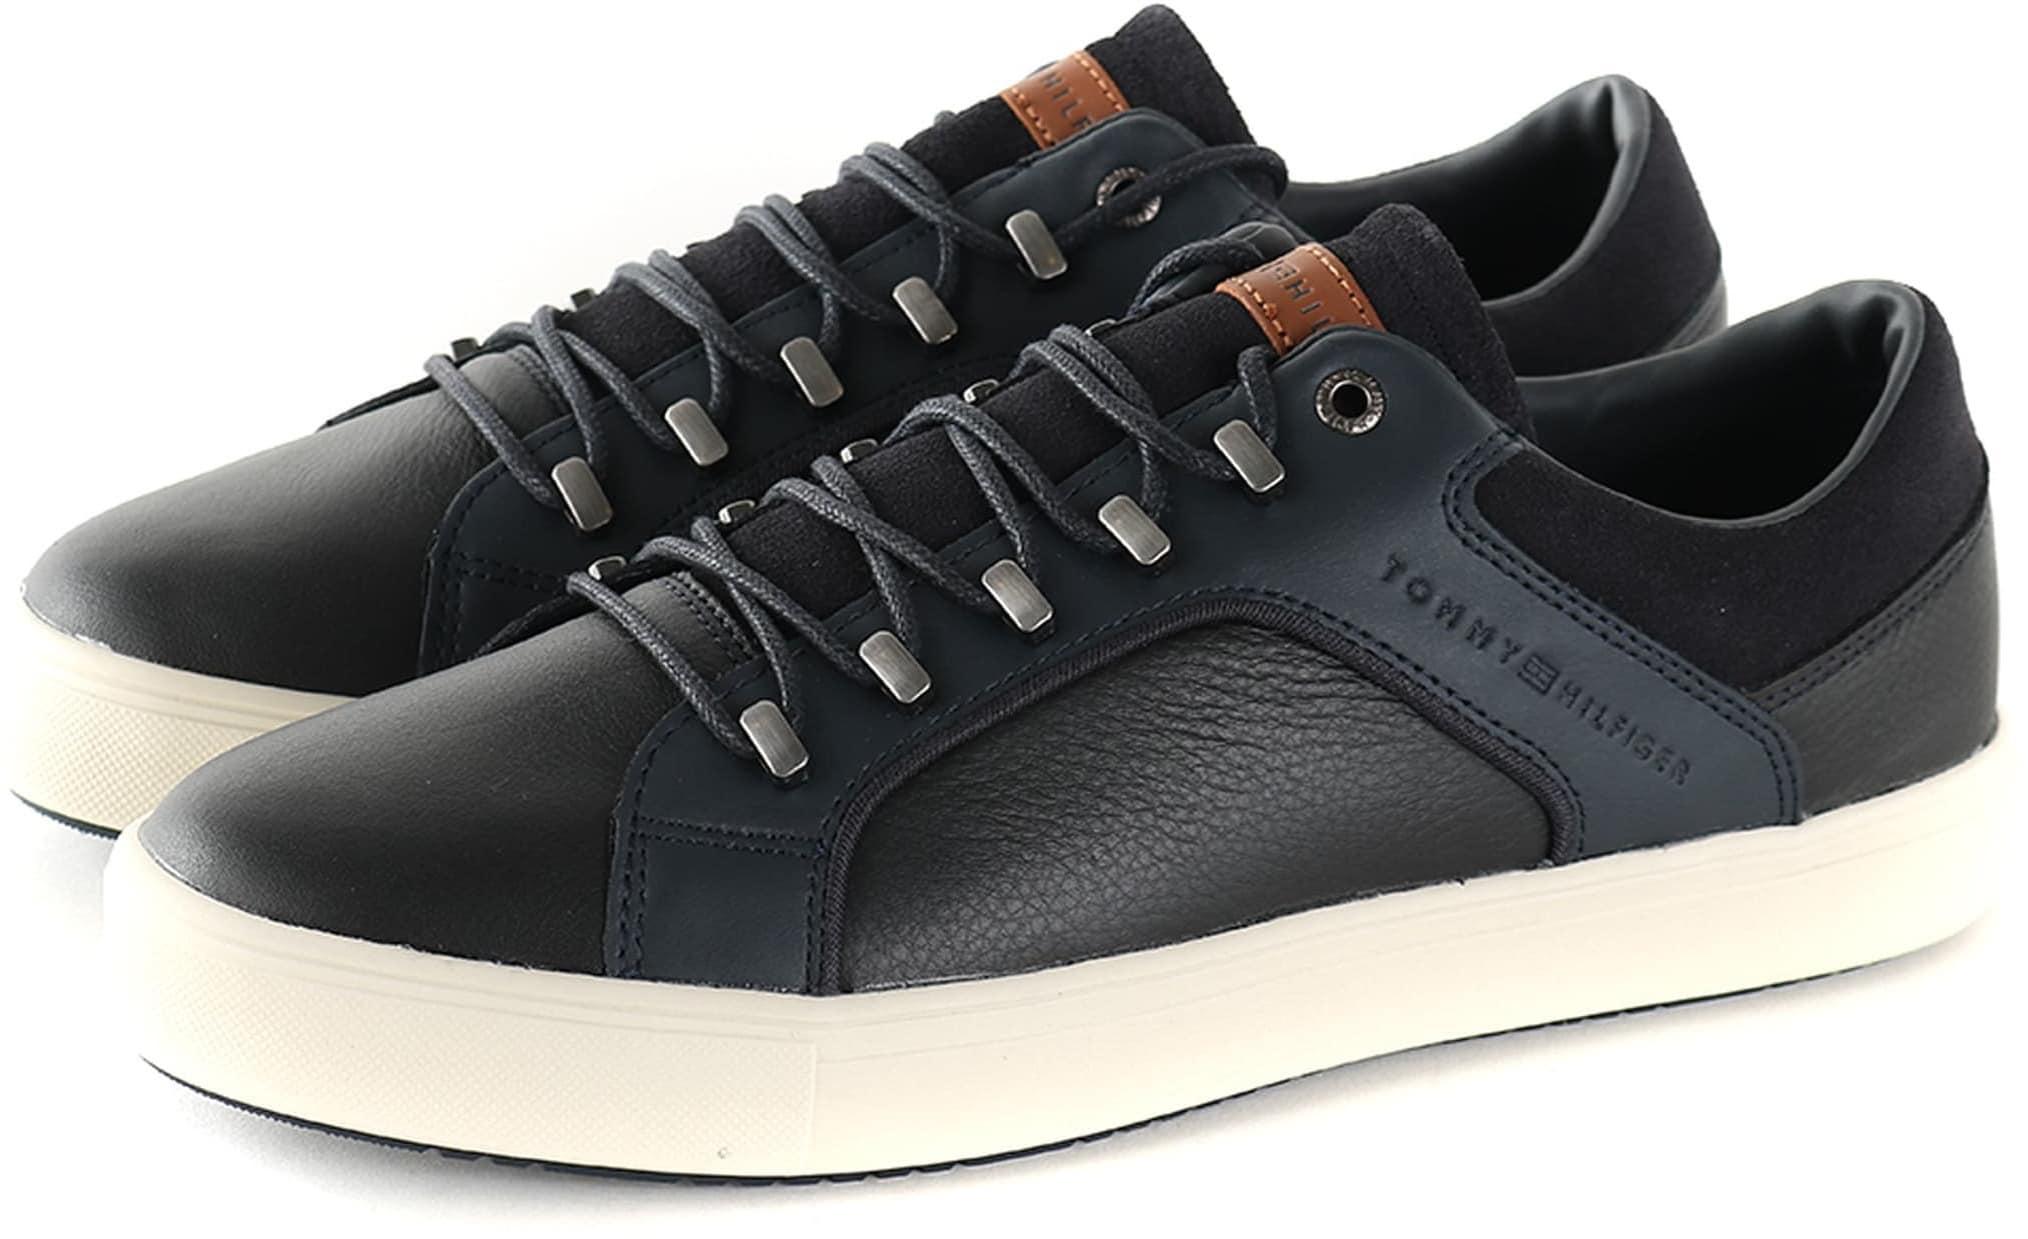 Tommy Hilfiger Sneaker Zwart + Donkerblauw foto 0